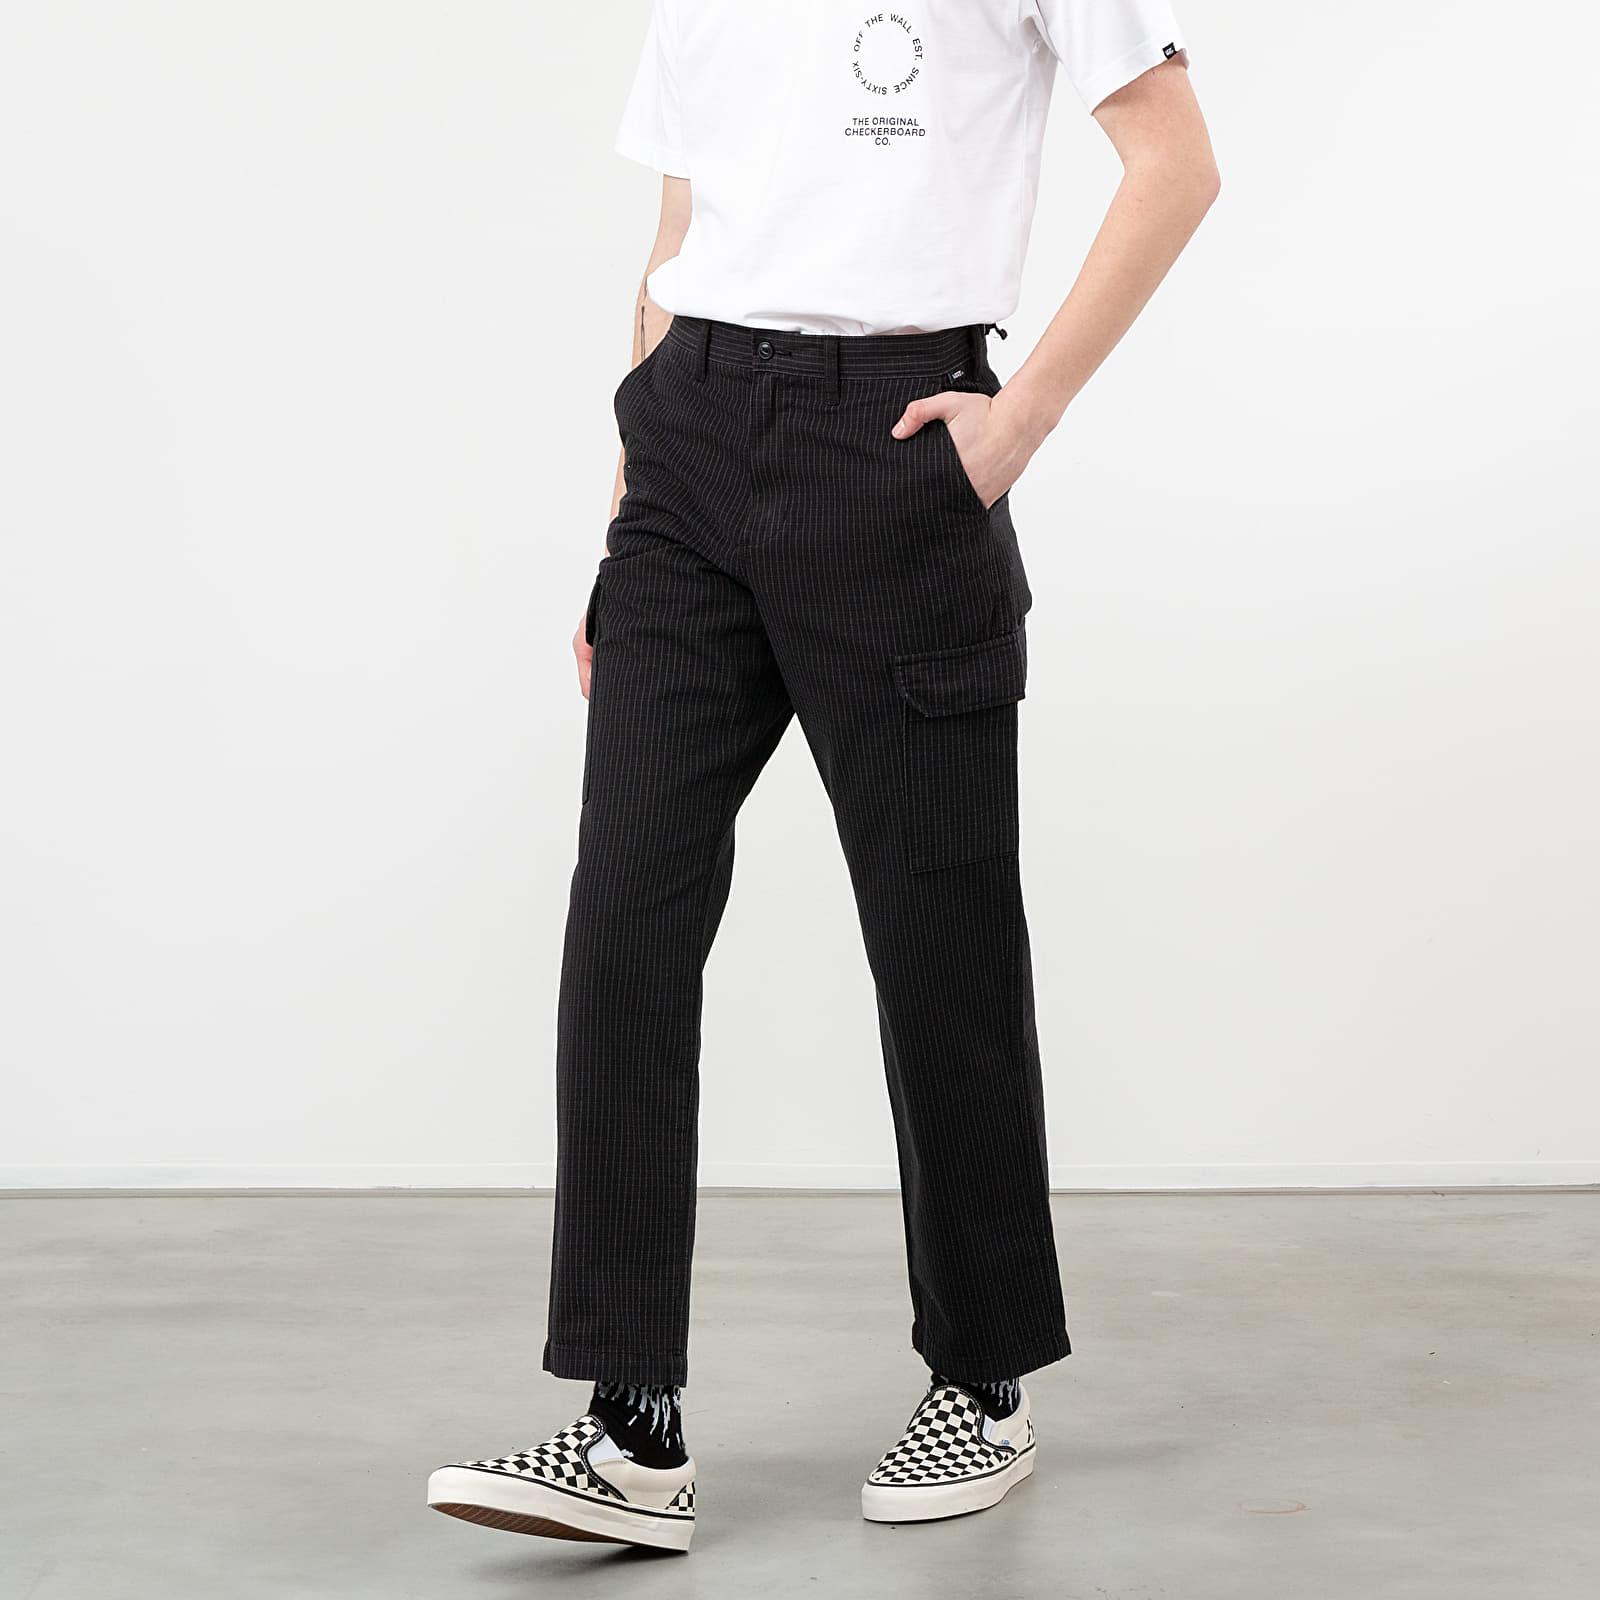 Pants and jeans Vans 2K Cargo Pants Black